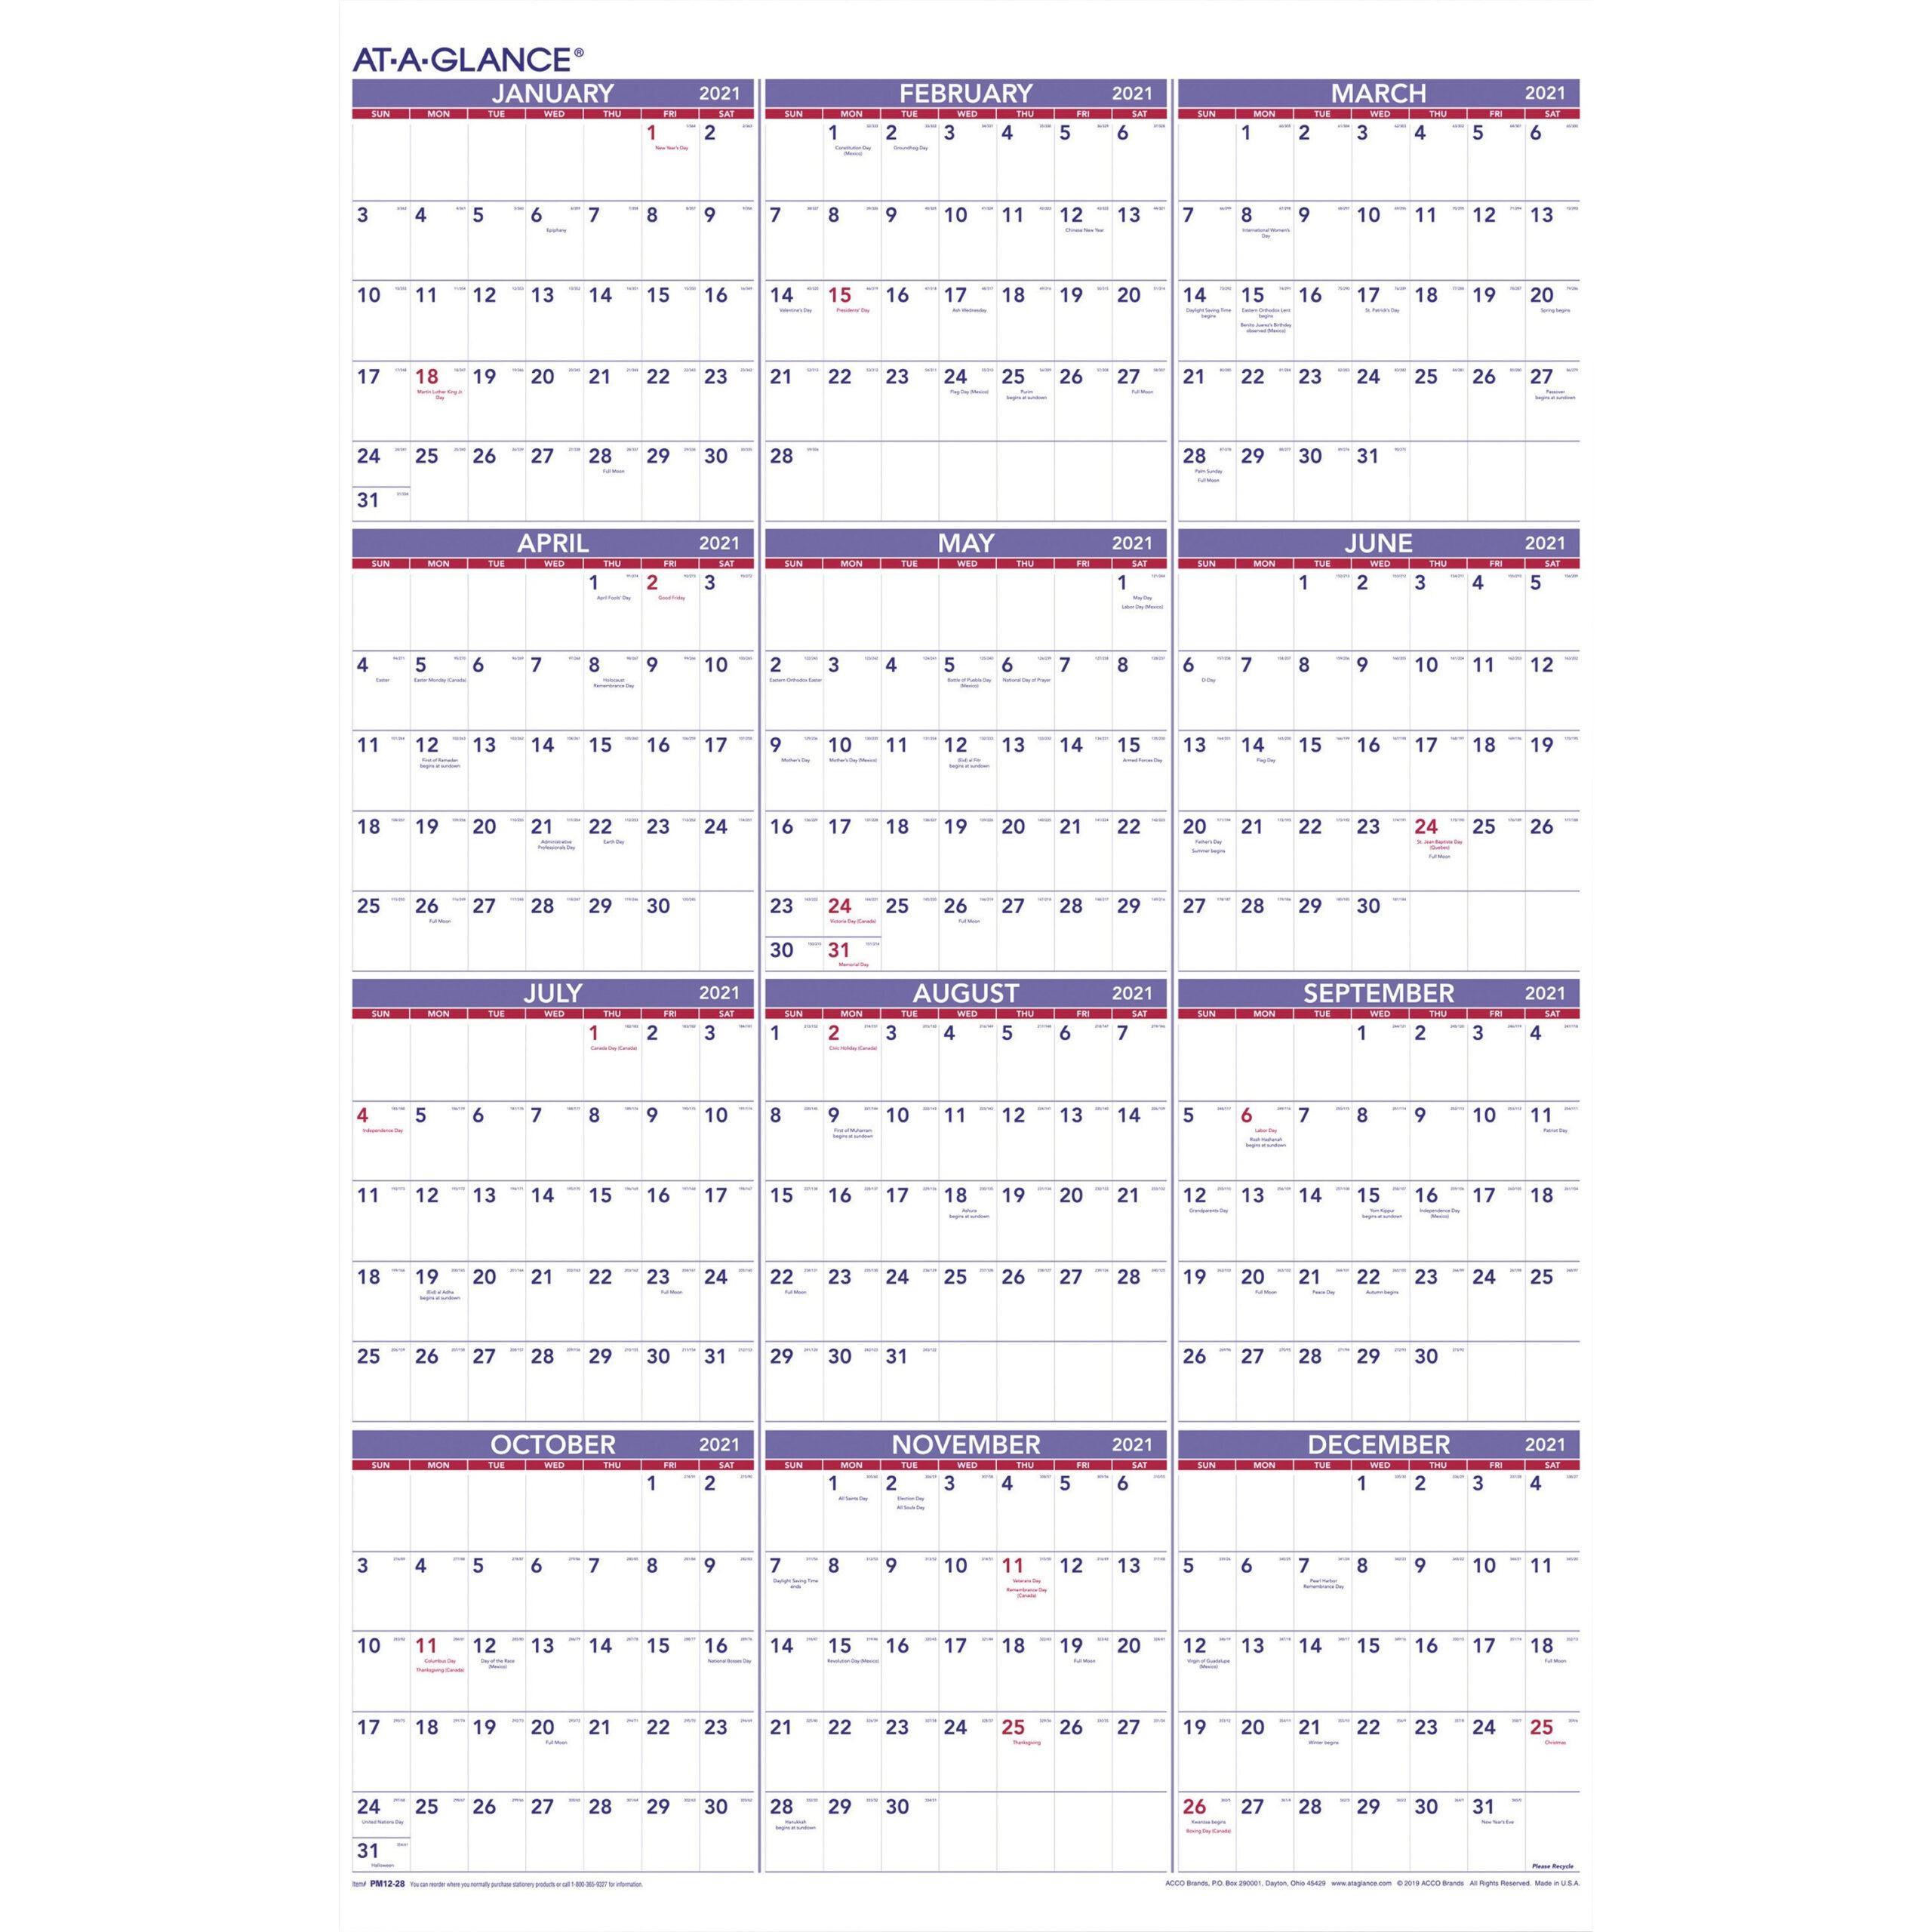 At-A-Glance Yearly Wall Calendar - Julian Dates - Yearly - 1 throughout Julian Date Calendar 2021